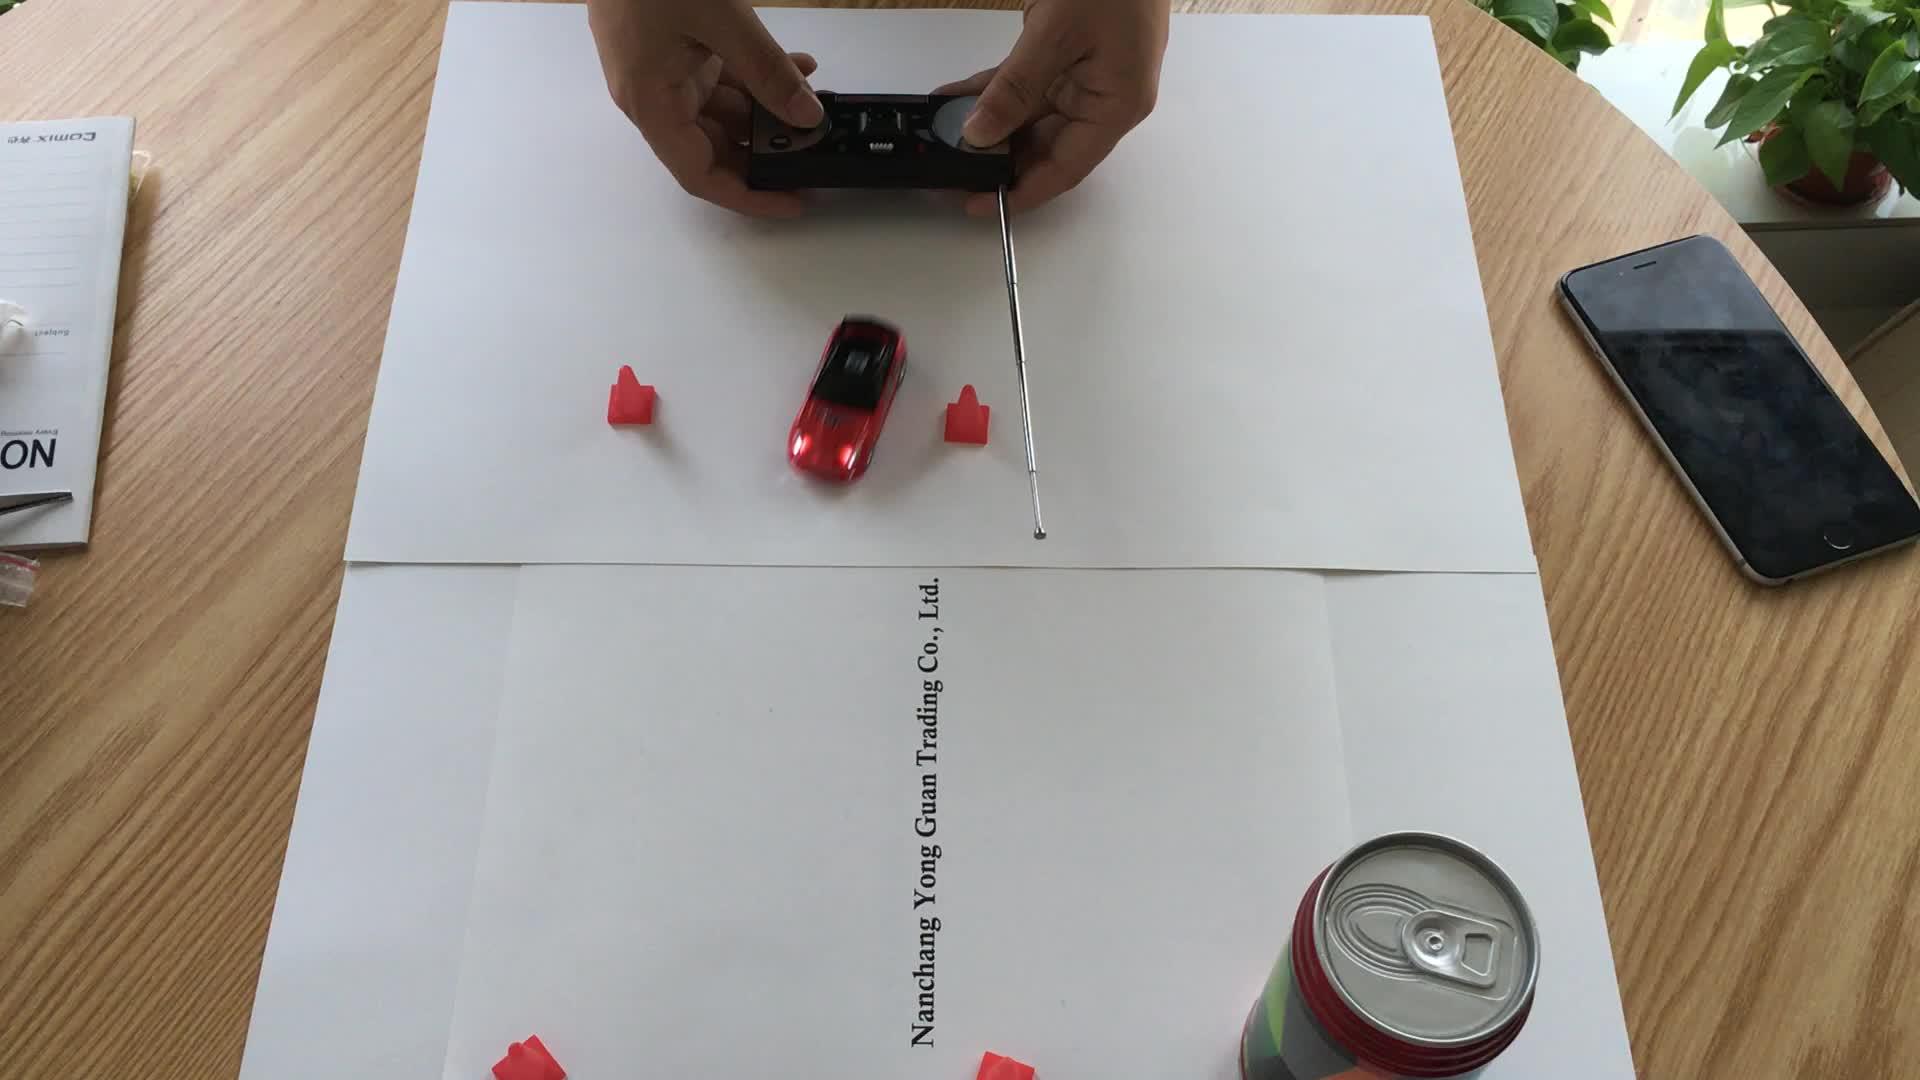 Coke Dapatkah RC Mobil Mini Remote Control Mobil Balap Pintu Bayi Mainan Listrik Radio Controlled Mainan Kit Dengan Cahaya